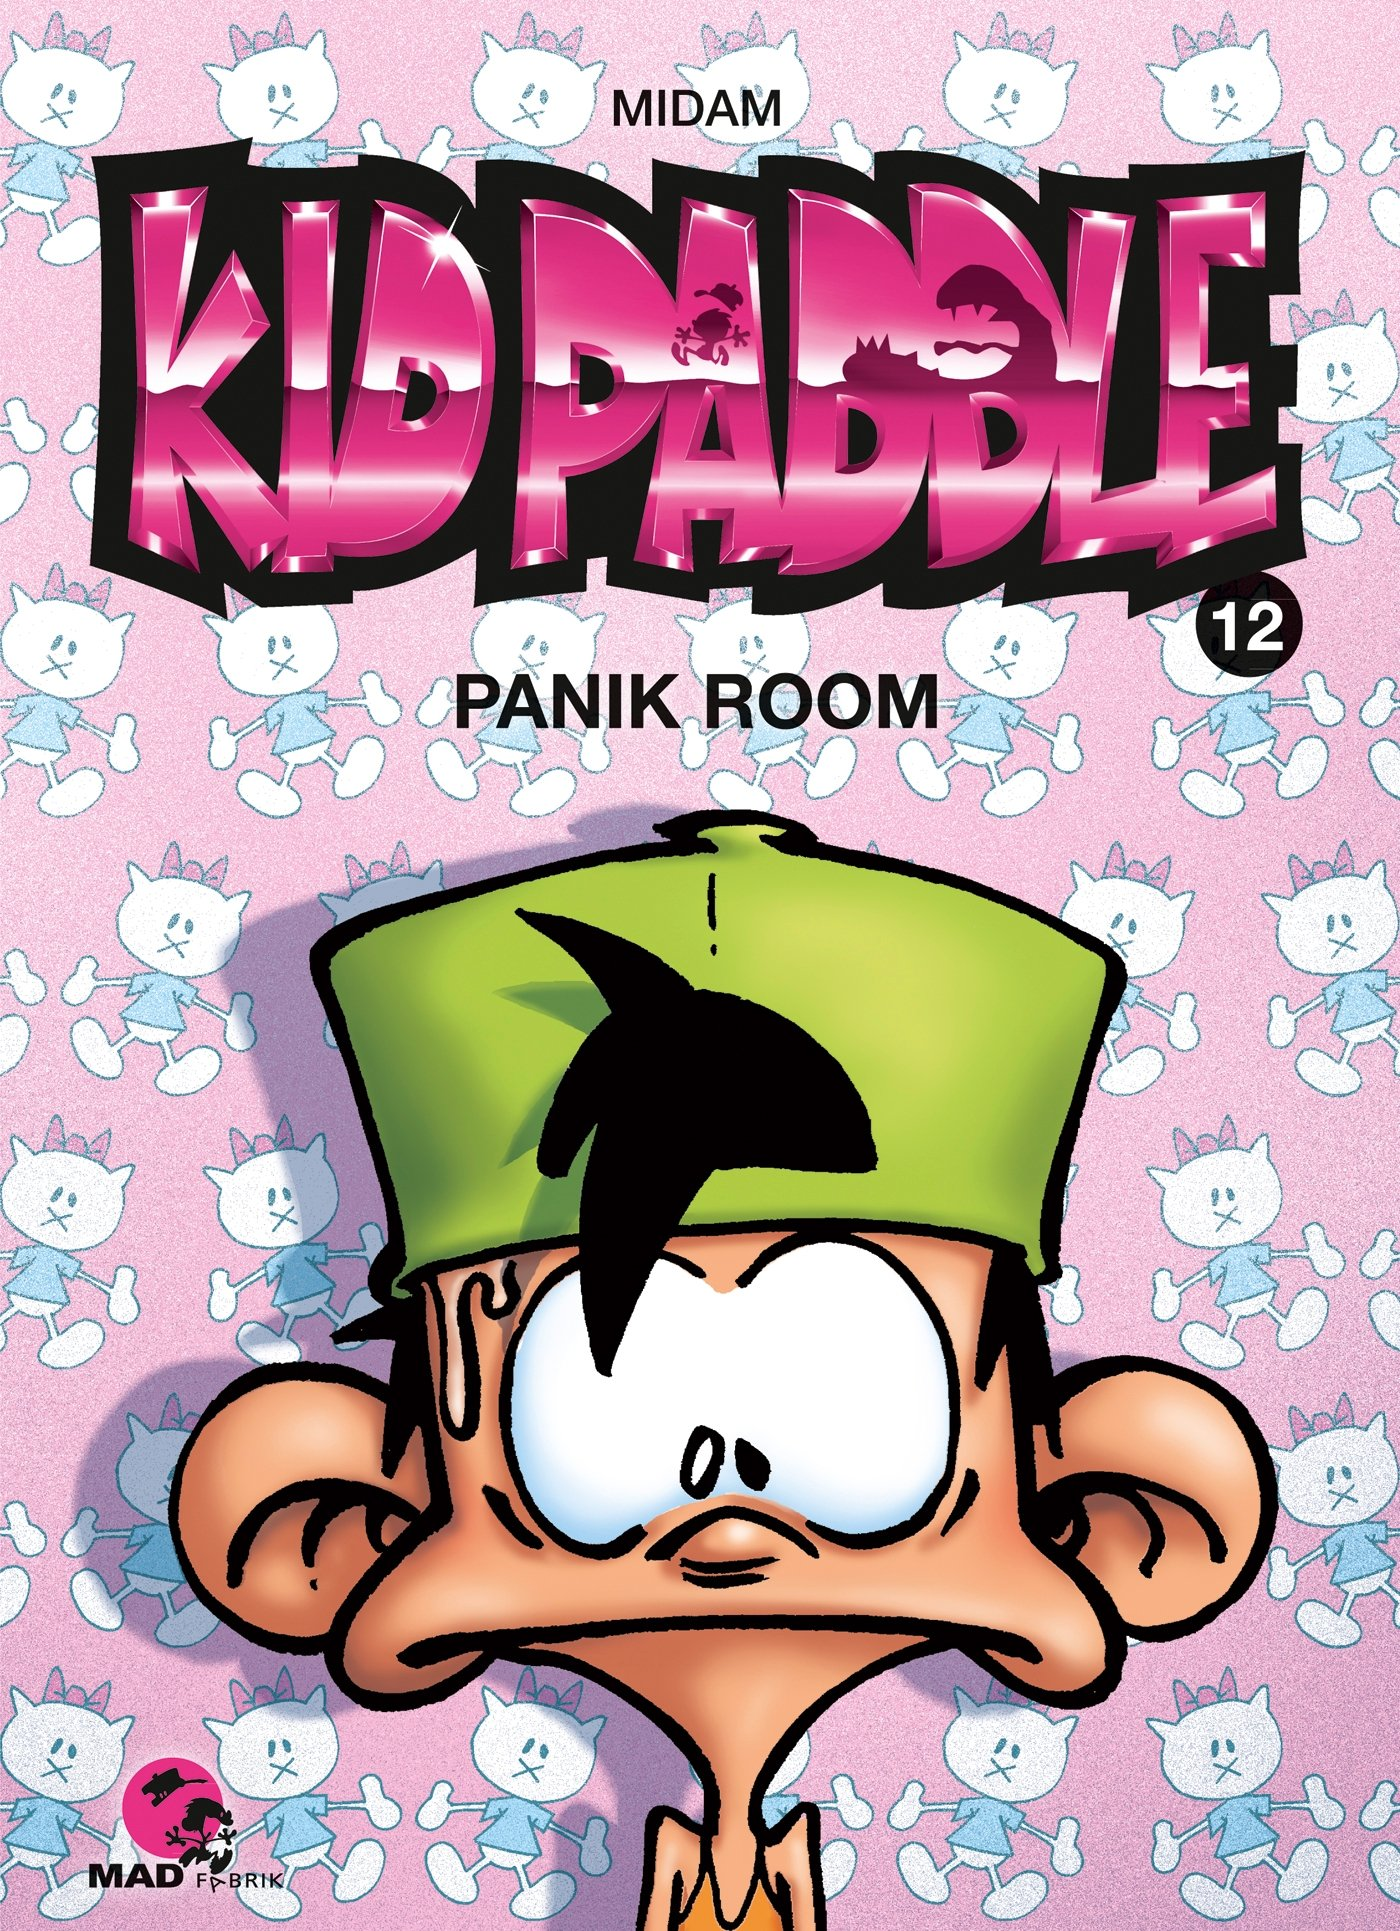 Kid Paddle Tome 12 - Panik Room